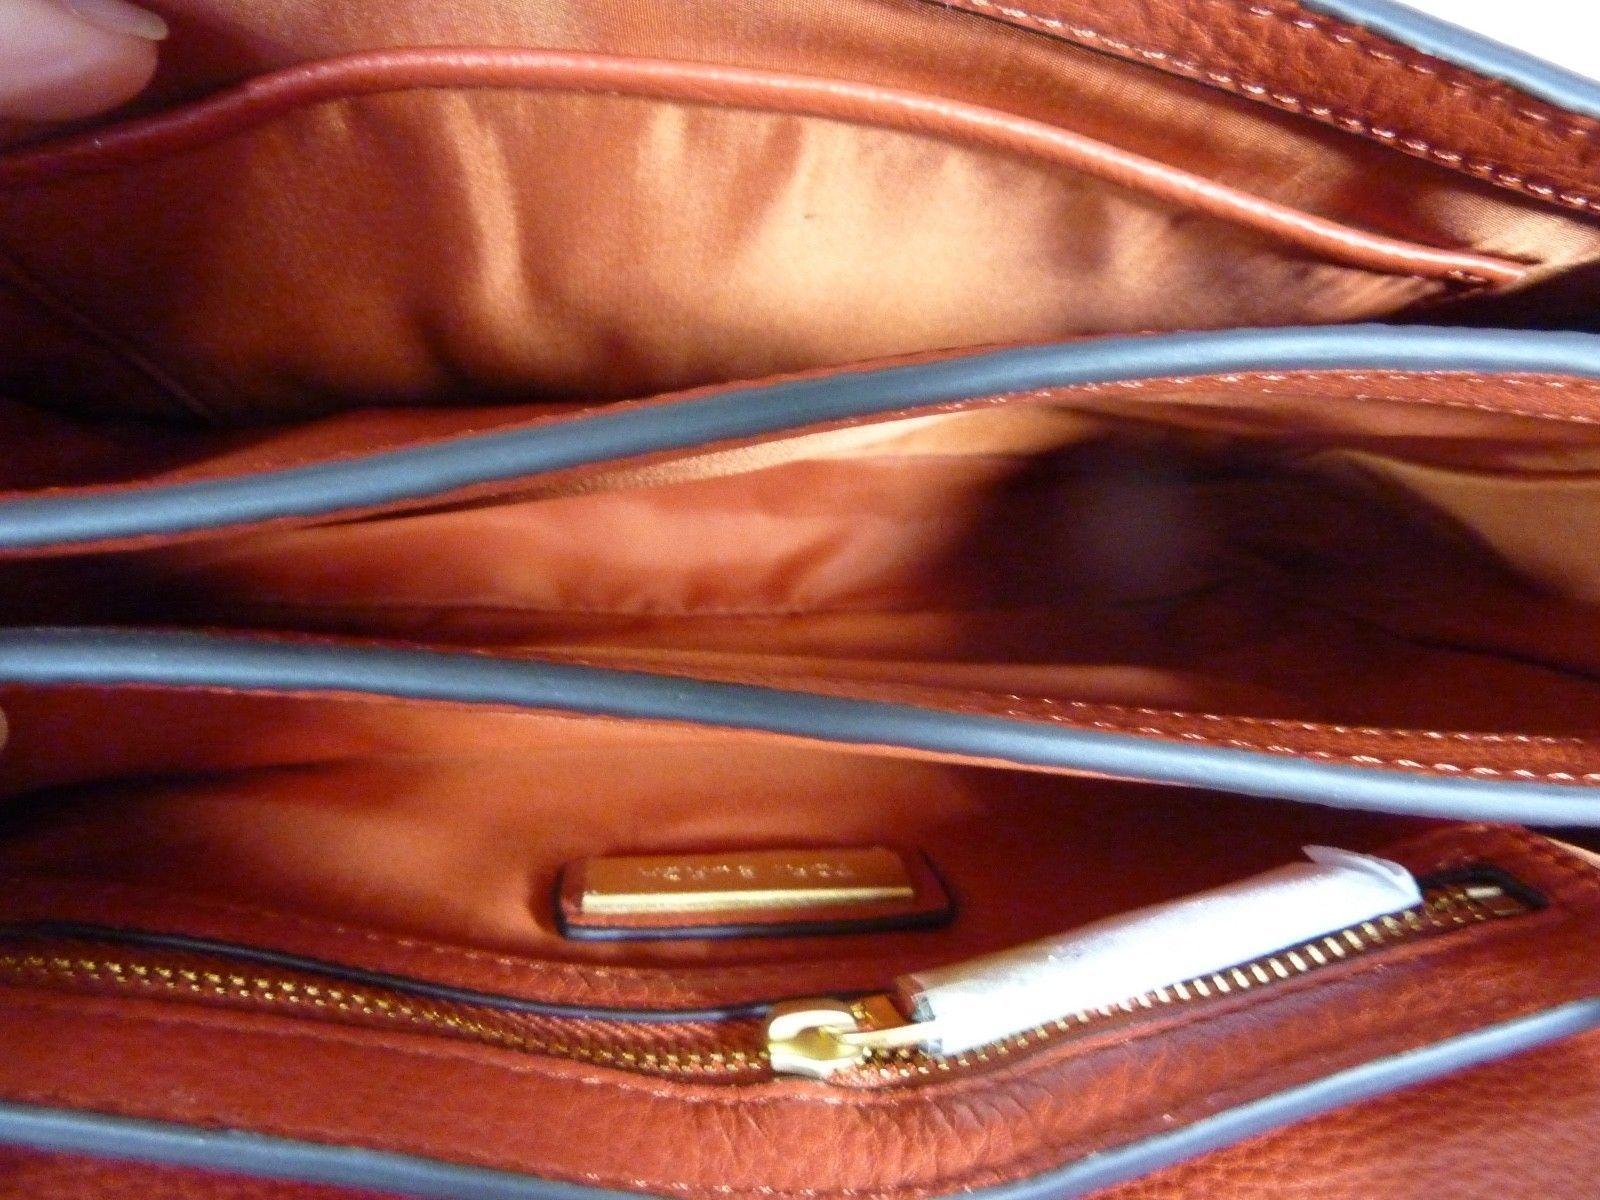 NWT Tory Burch Kola Chelsea Convertible Shoulder Bag  - $498 image 10